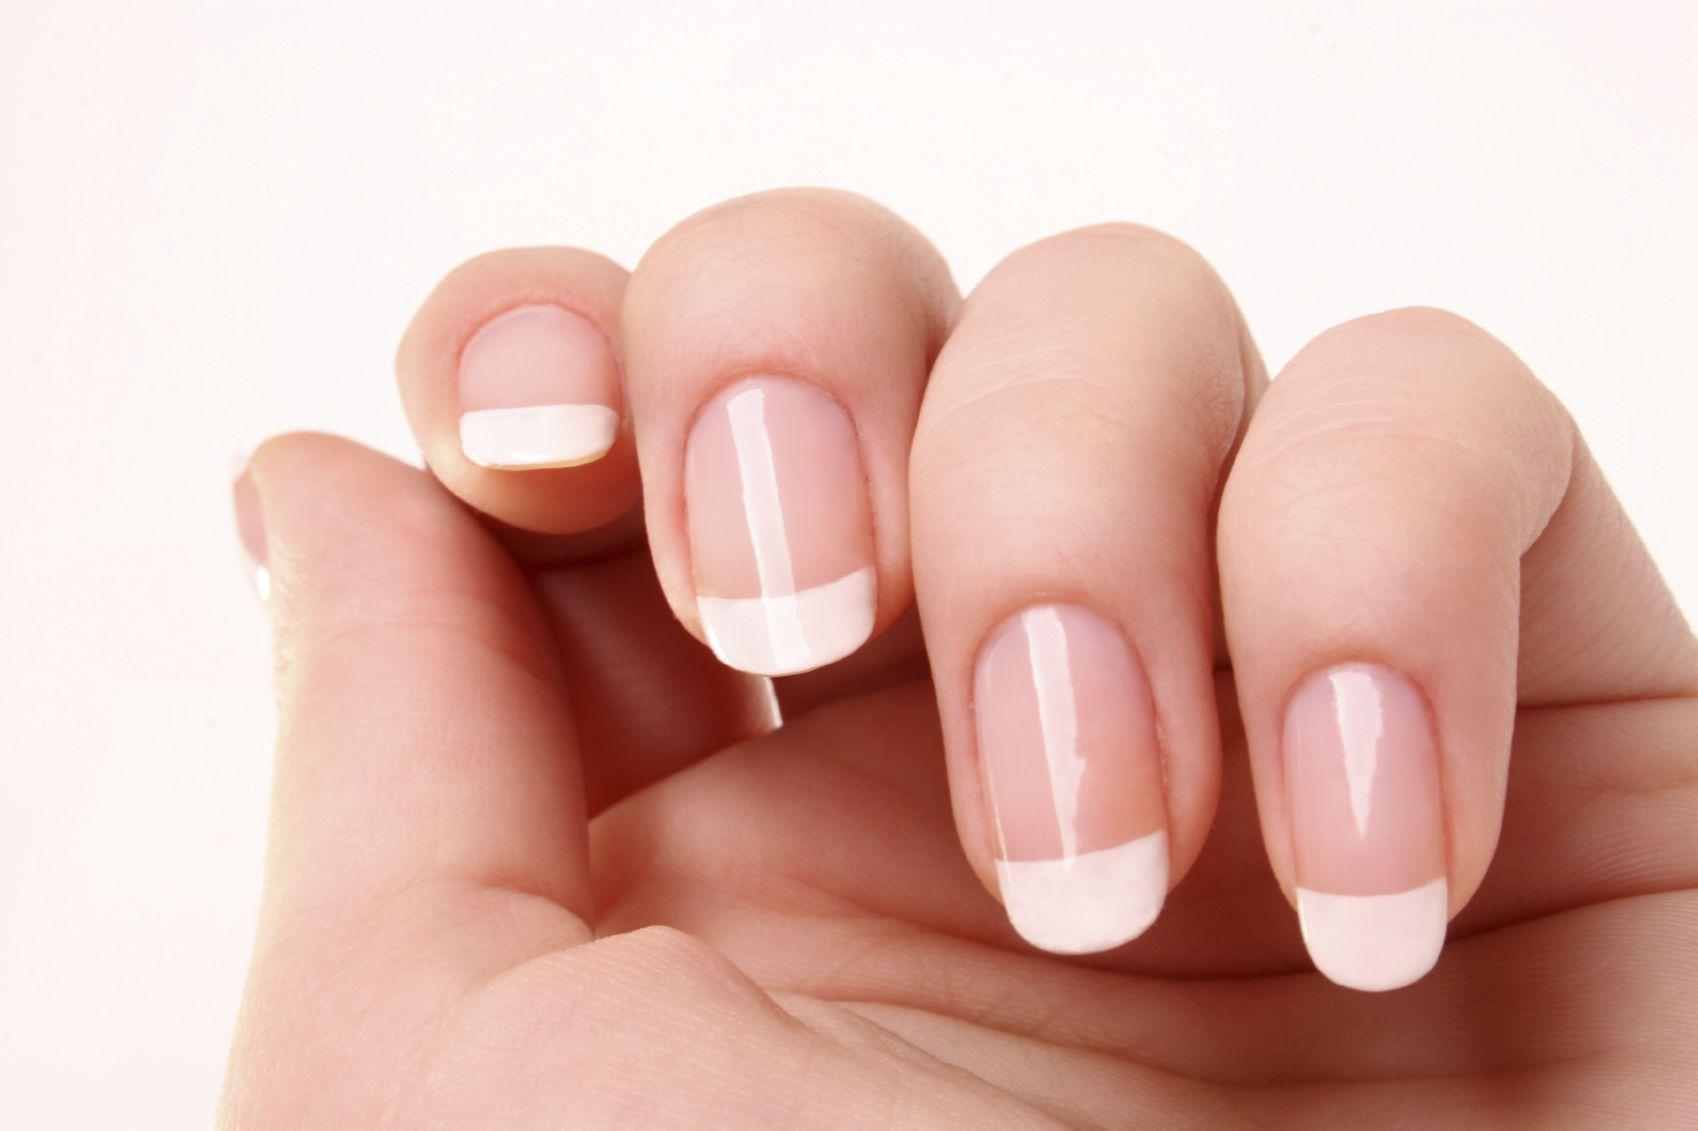 nagellack maniküre nailart schöne kurze nageldesign nägel design ...